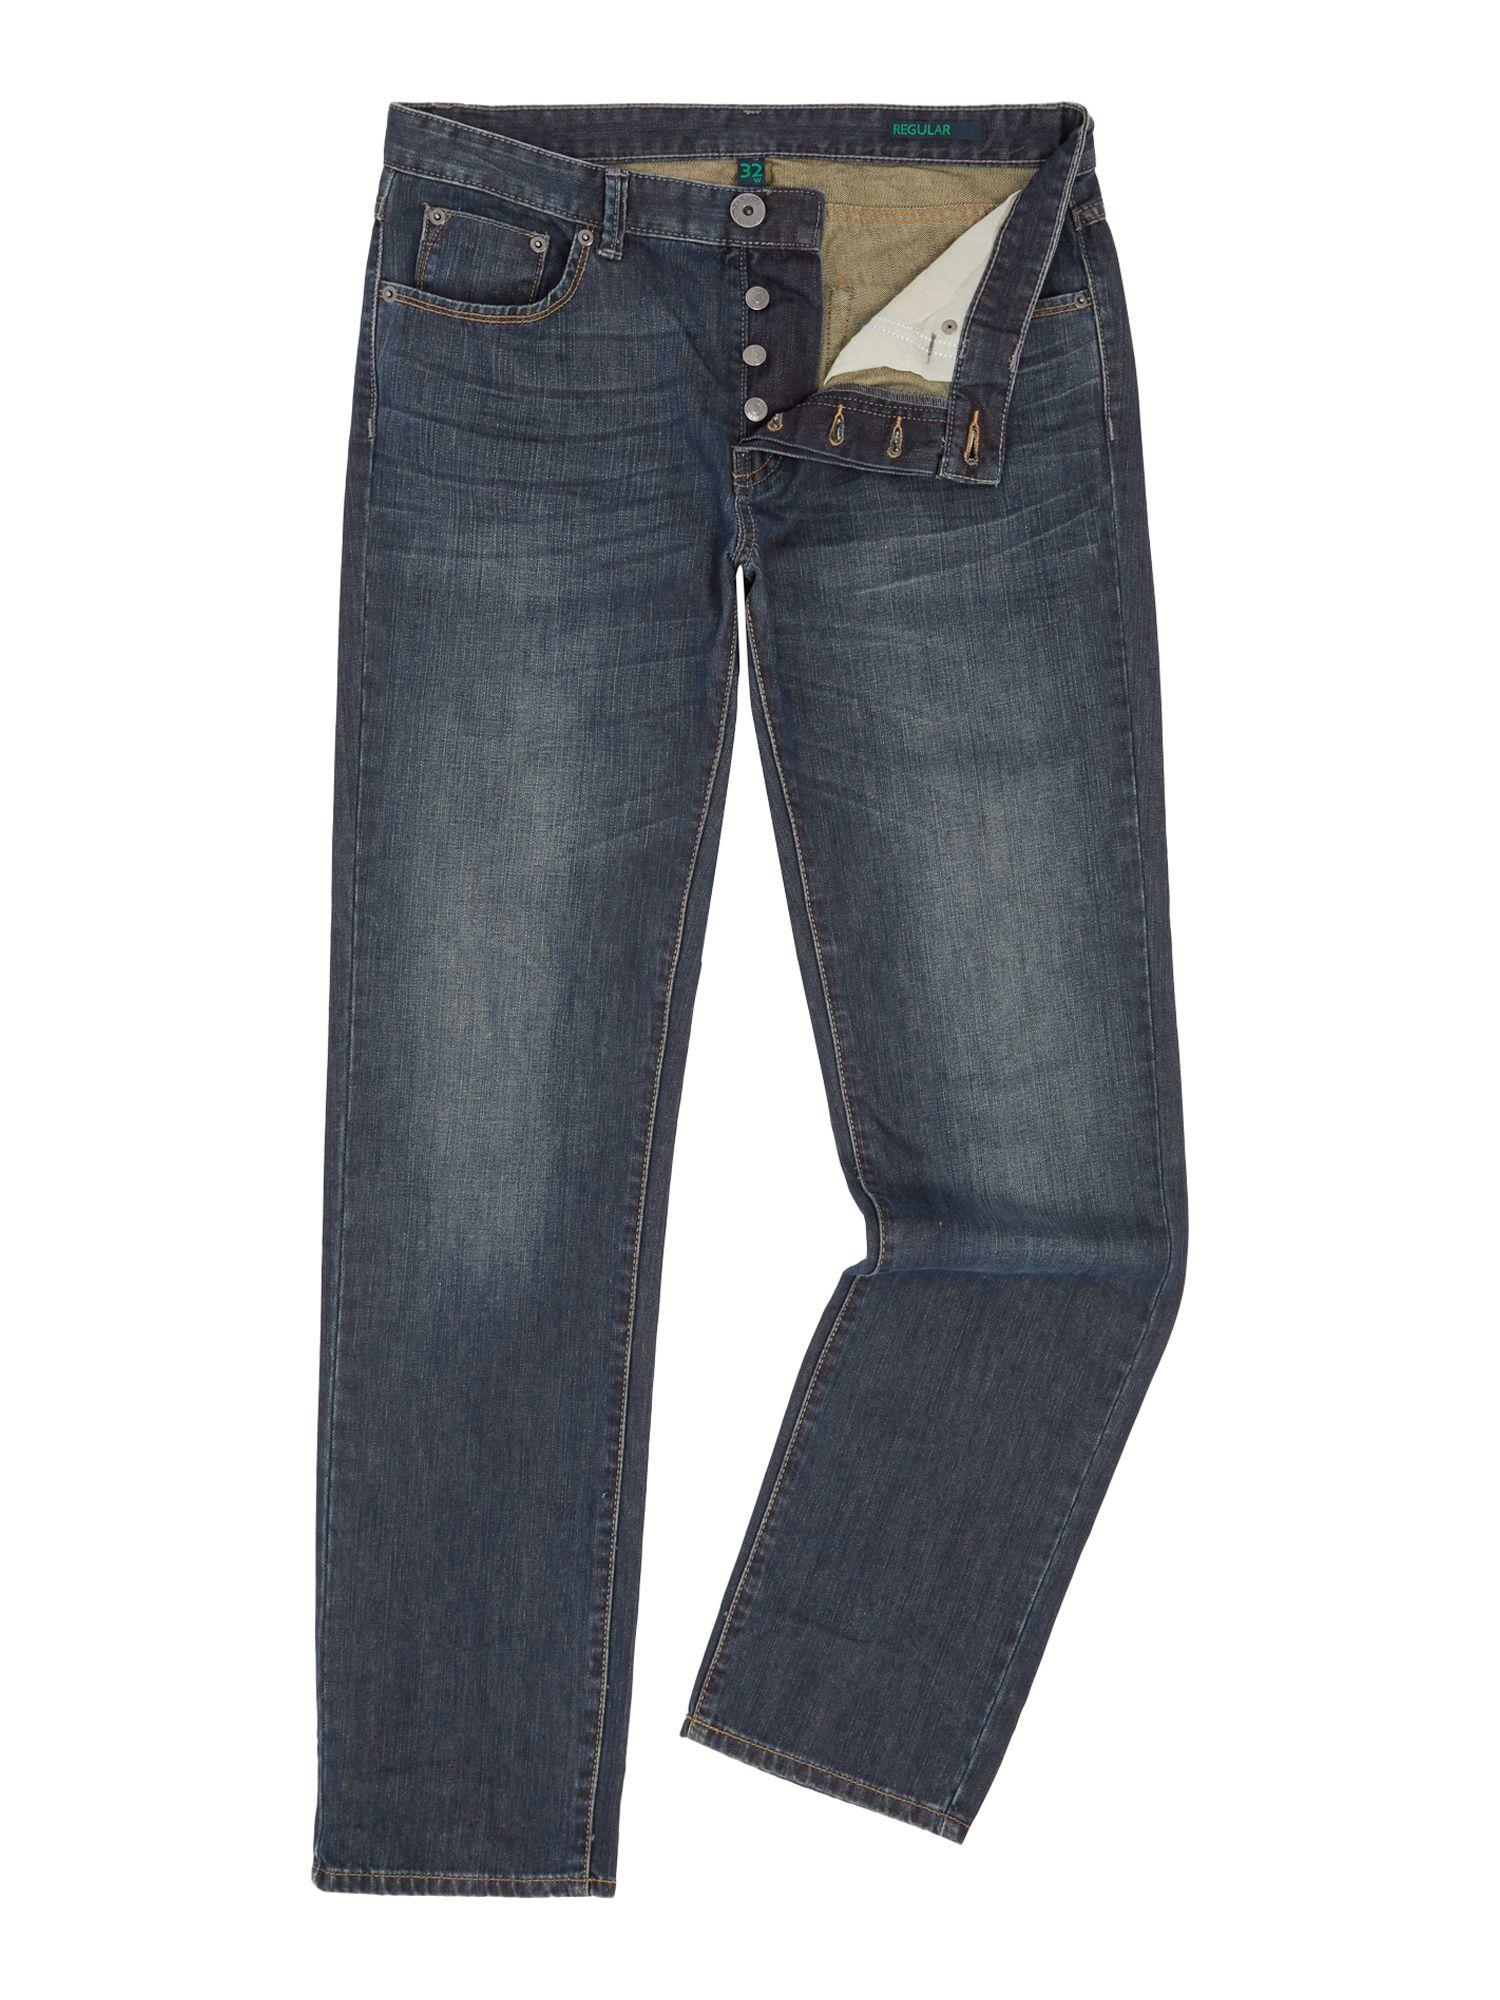 Benetton Denim Mid Wash Regular Fit Jeans in Denim (Blue) for Men